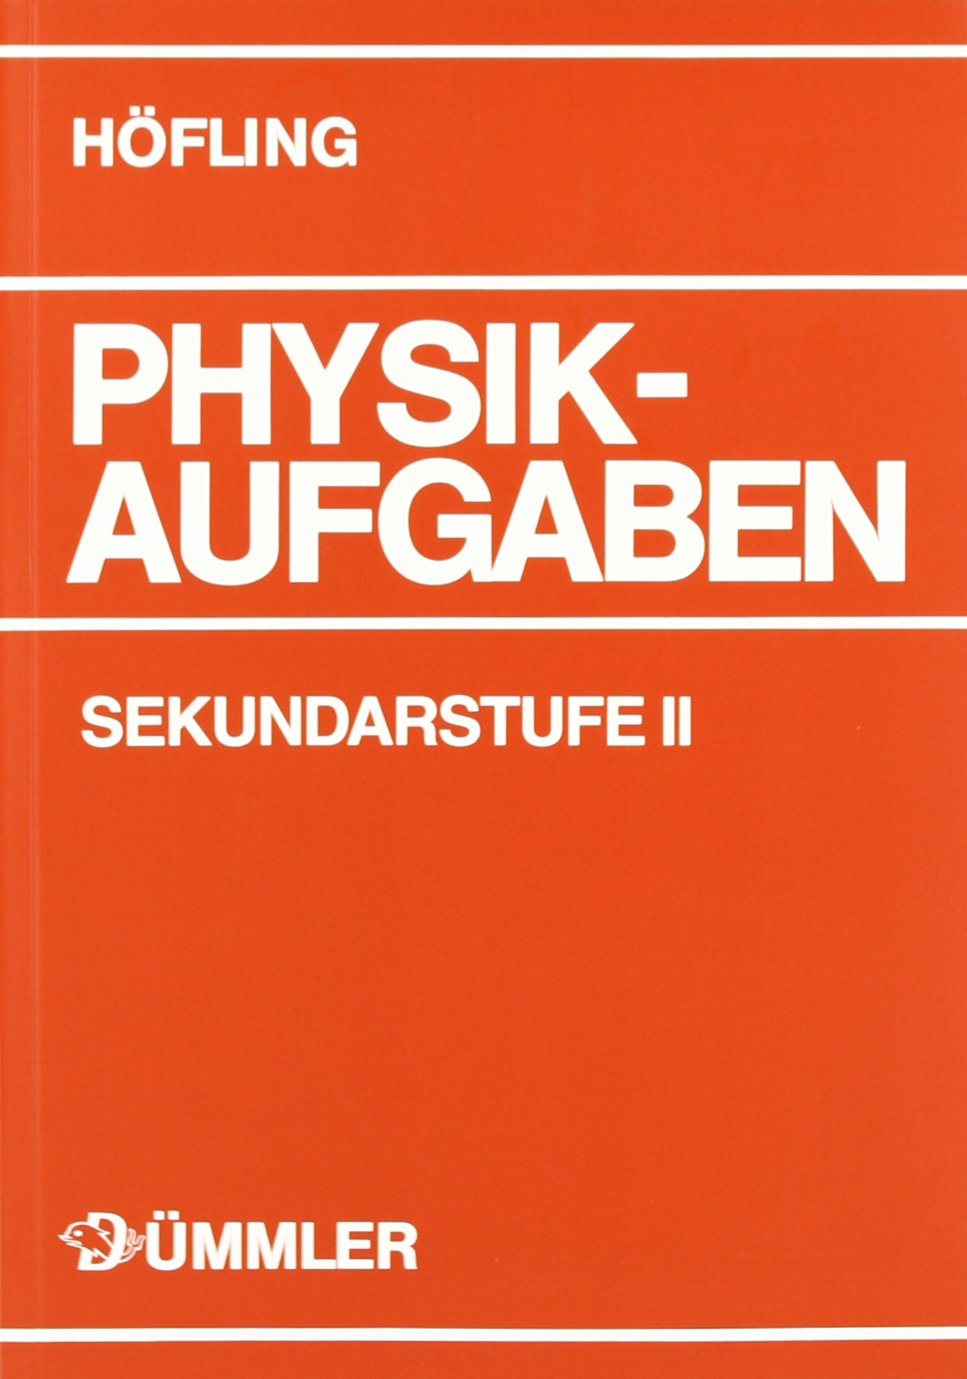 Physik, Physikaufgaben, Sekundarstufe II, Schülerausgabe